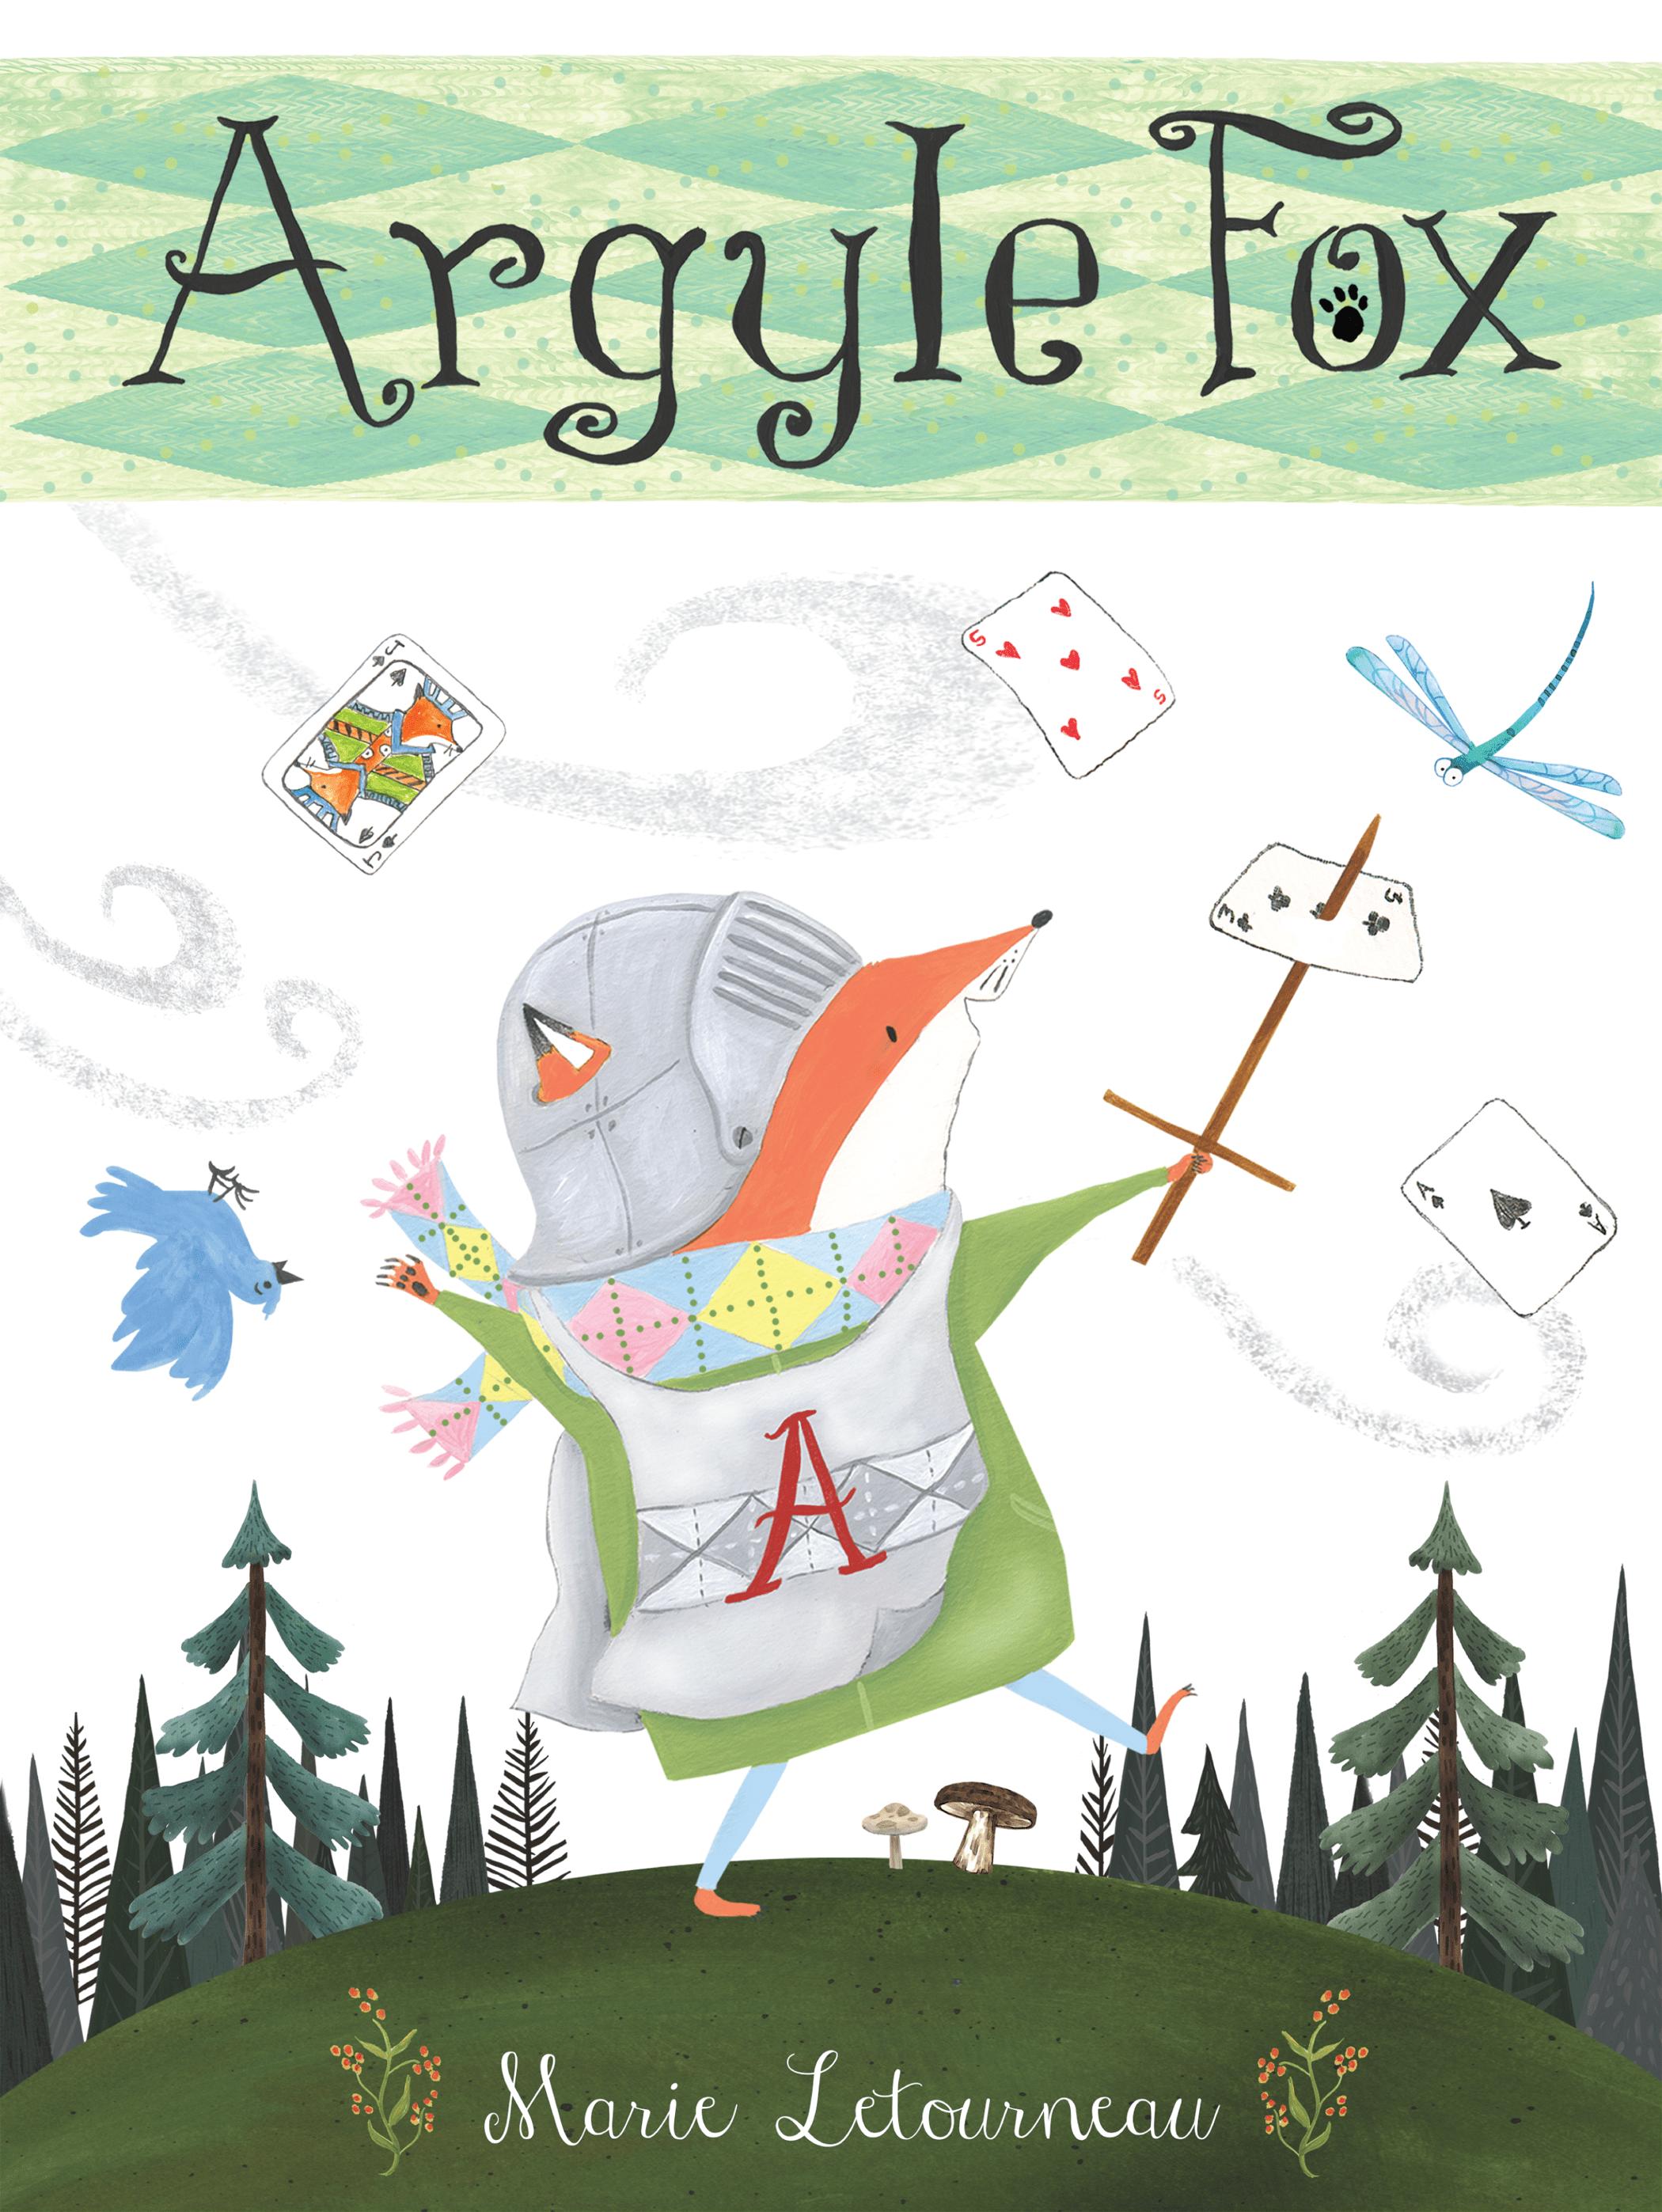 celebrate-picture-books-picture-book-review-argyle-fox-cover